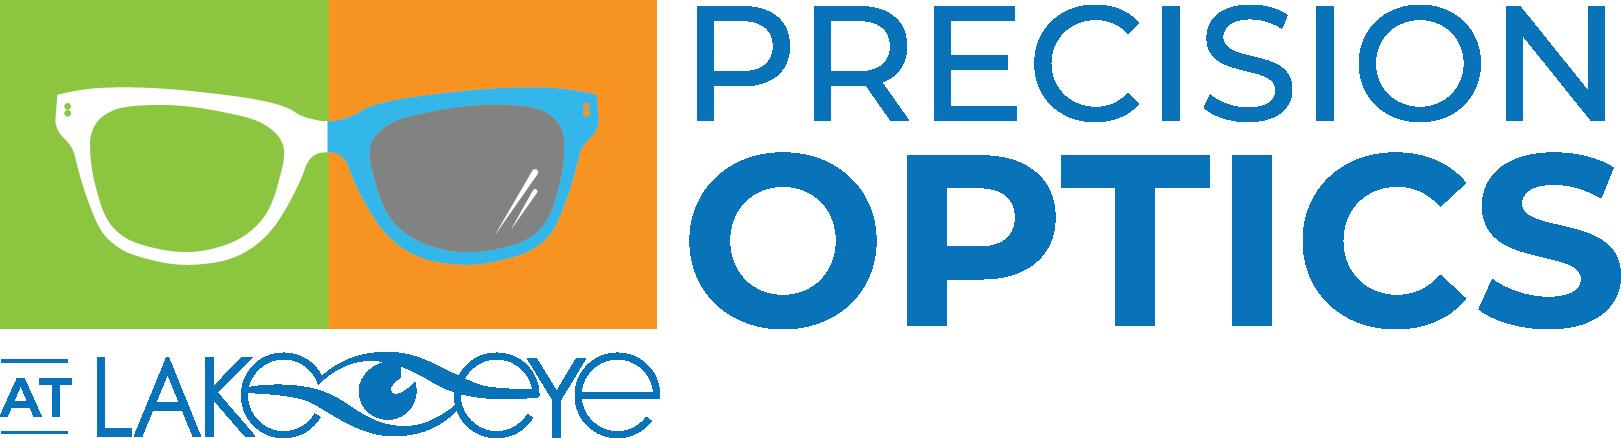 PrecisionOptics_wLEYE_horiz.png